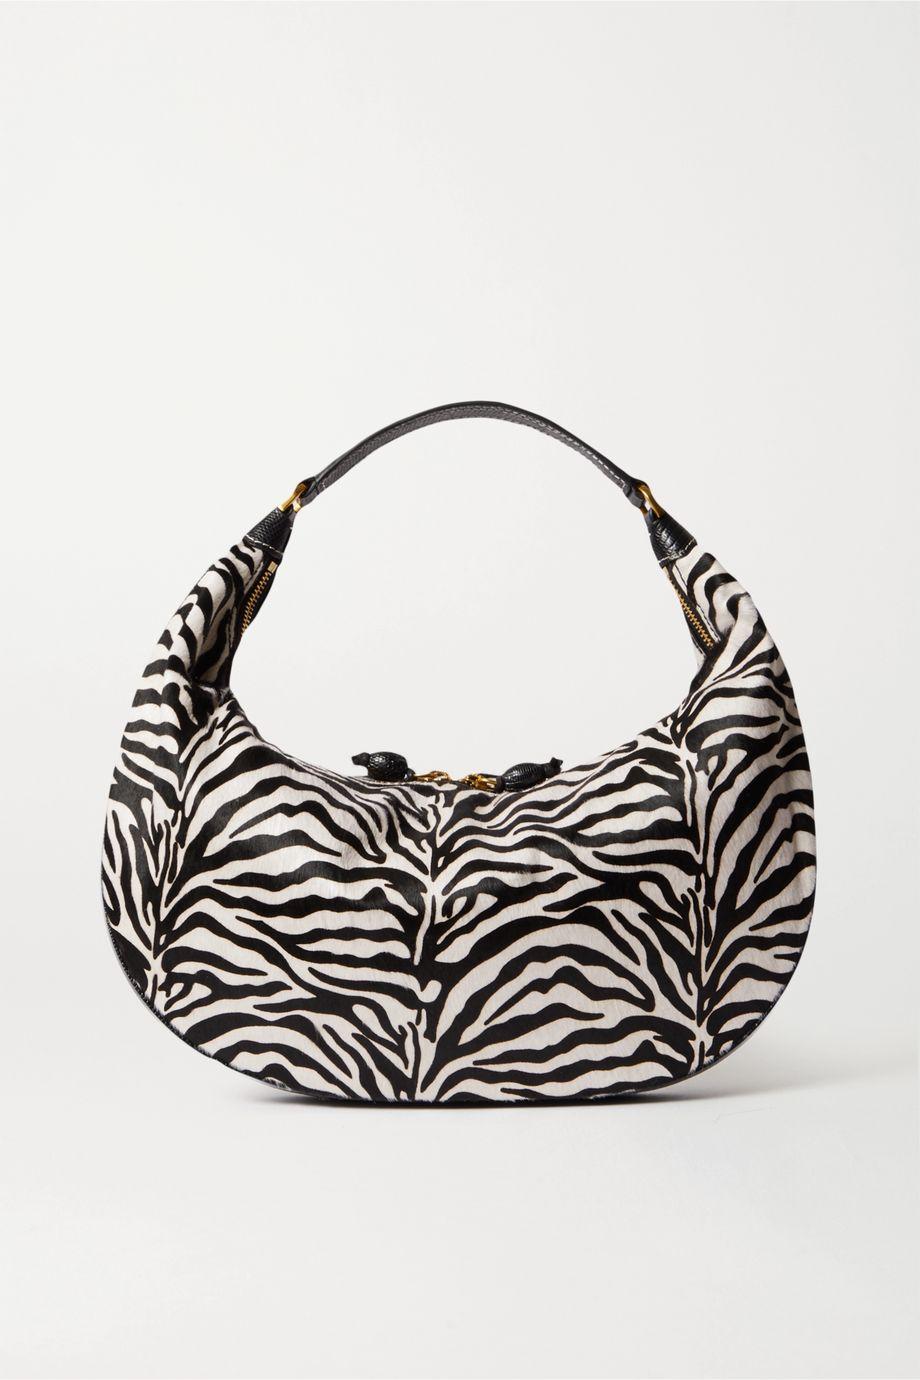 STAUD Sasha textured leather-trimmed zebra-print calf hair shoulder bag